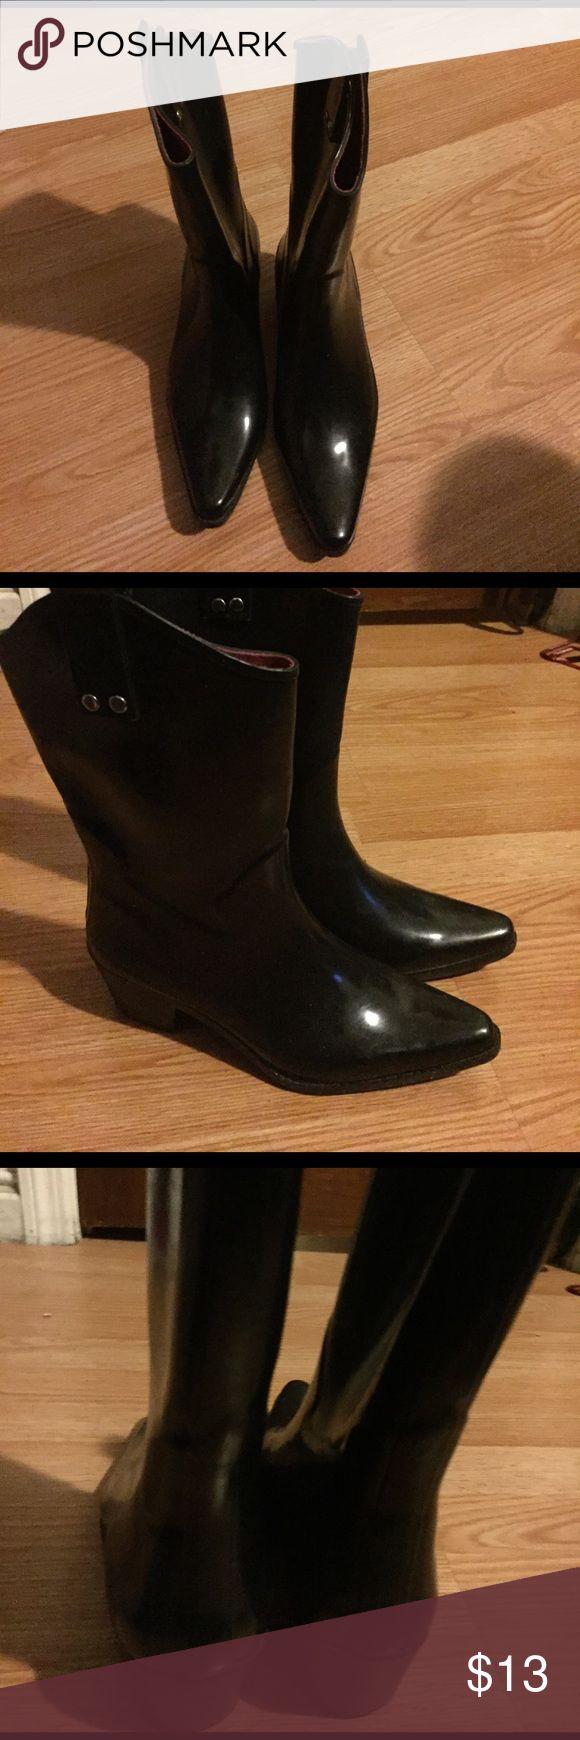 Black rain boots Black capelli cowgirl rain boots. Worn an handful of times. Enjoy the rain in style! capelli Shoes Winter & Rain Boots